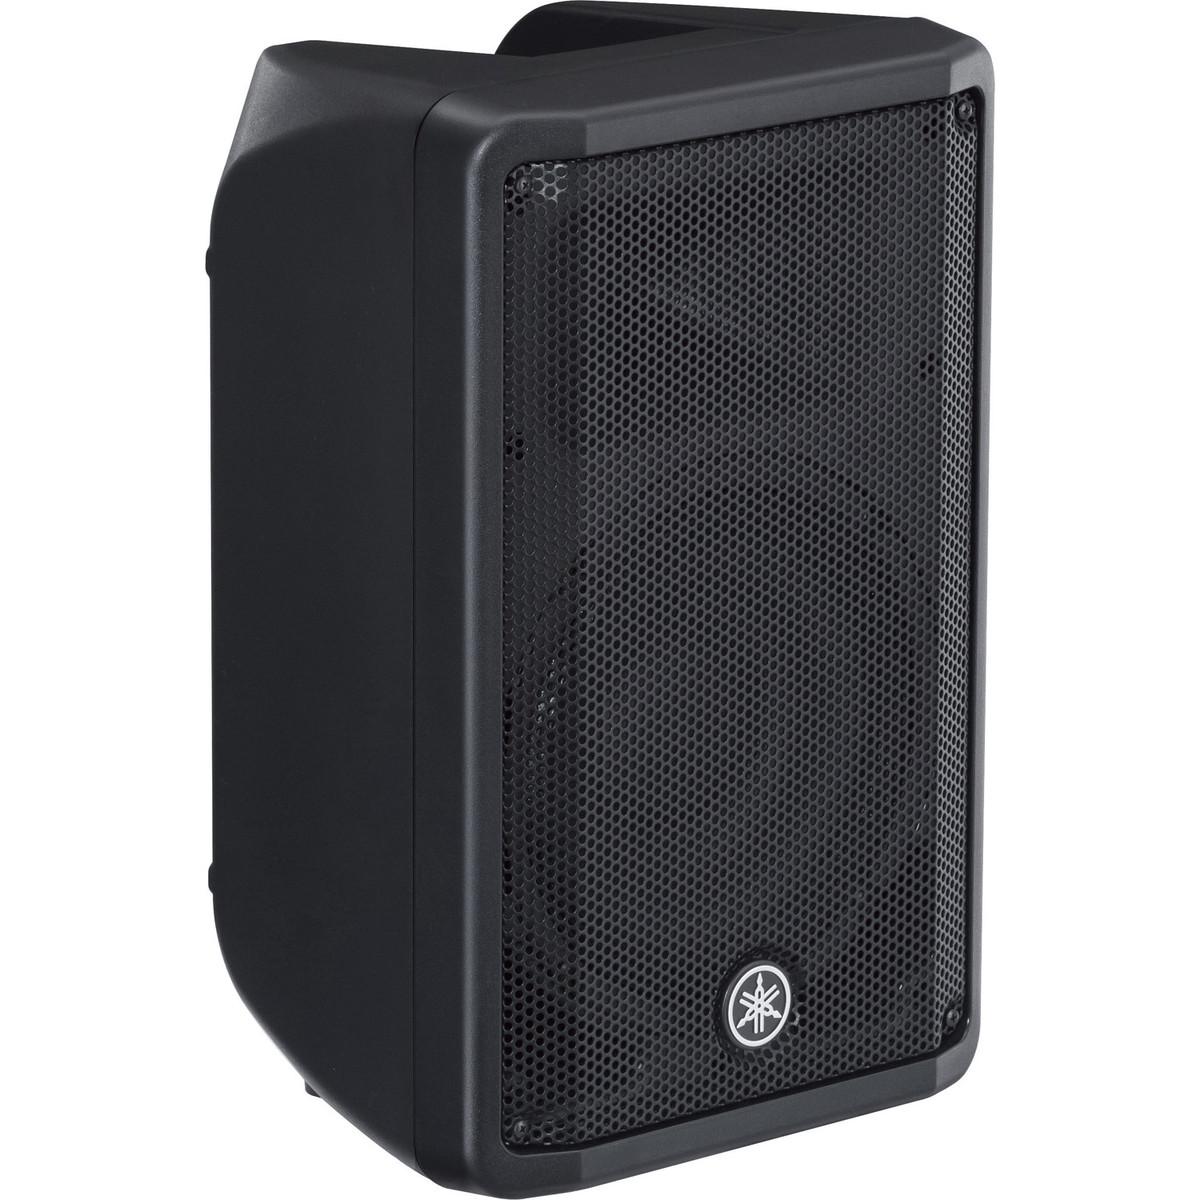 Speaker Stand For Yamaha Dbr